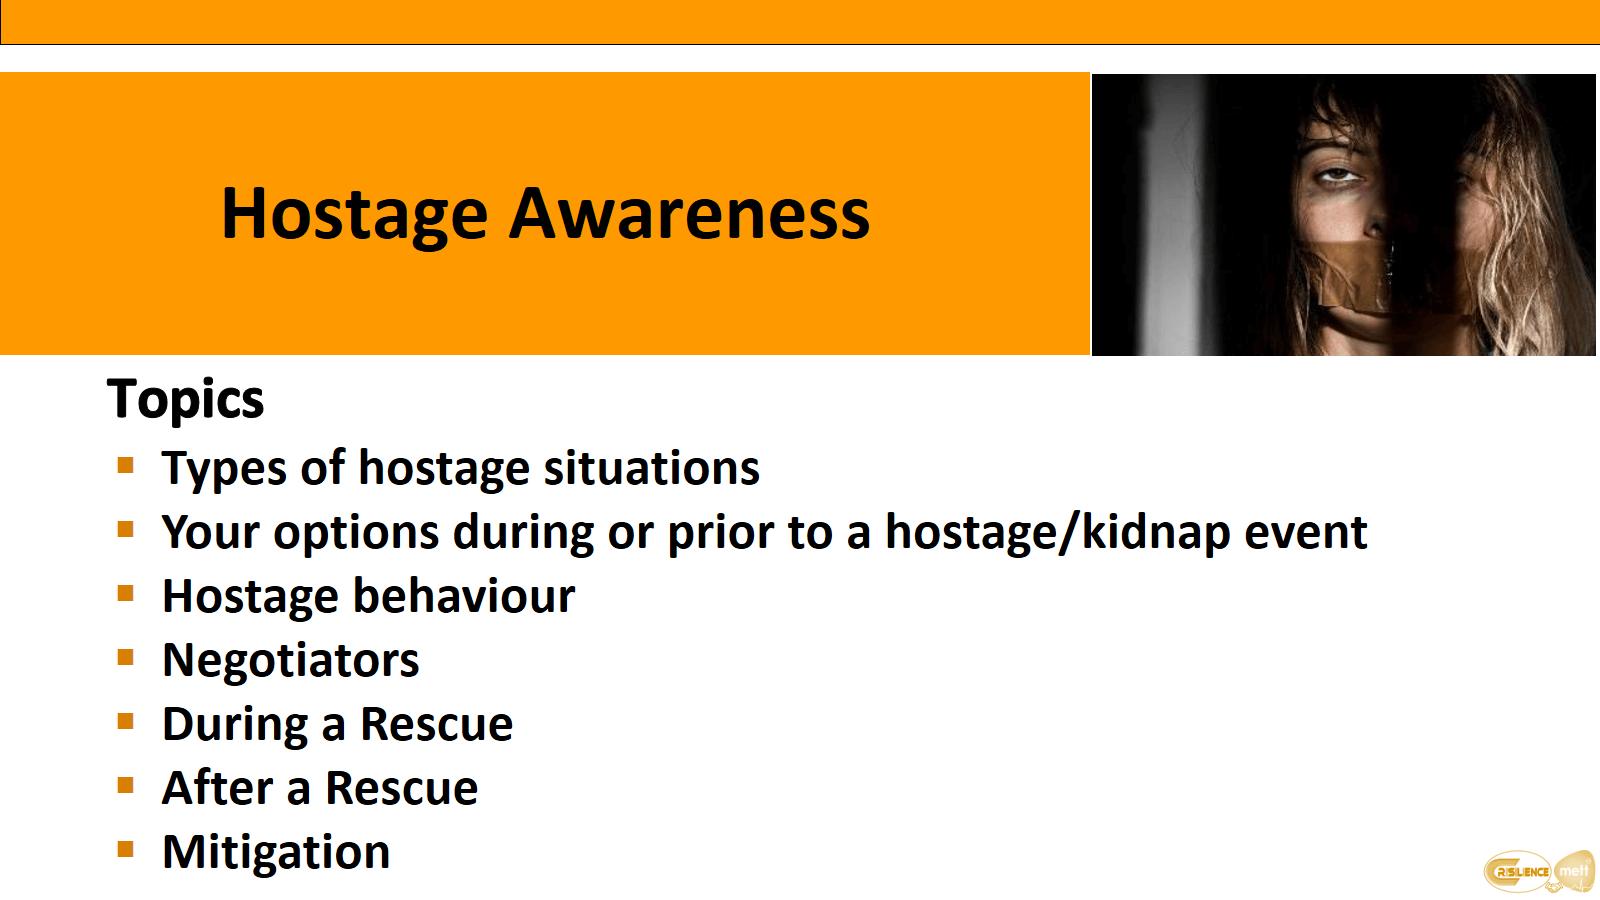 CIMAT Hostage Awareness Topics